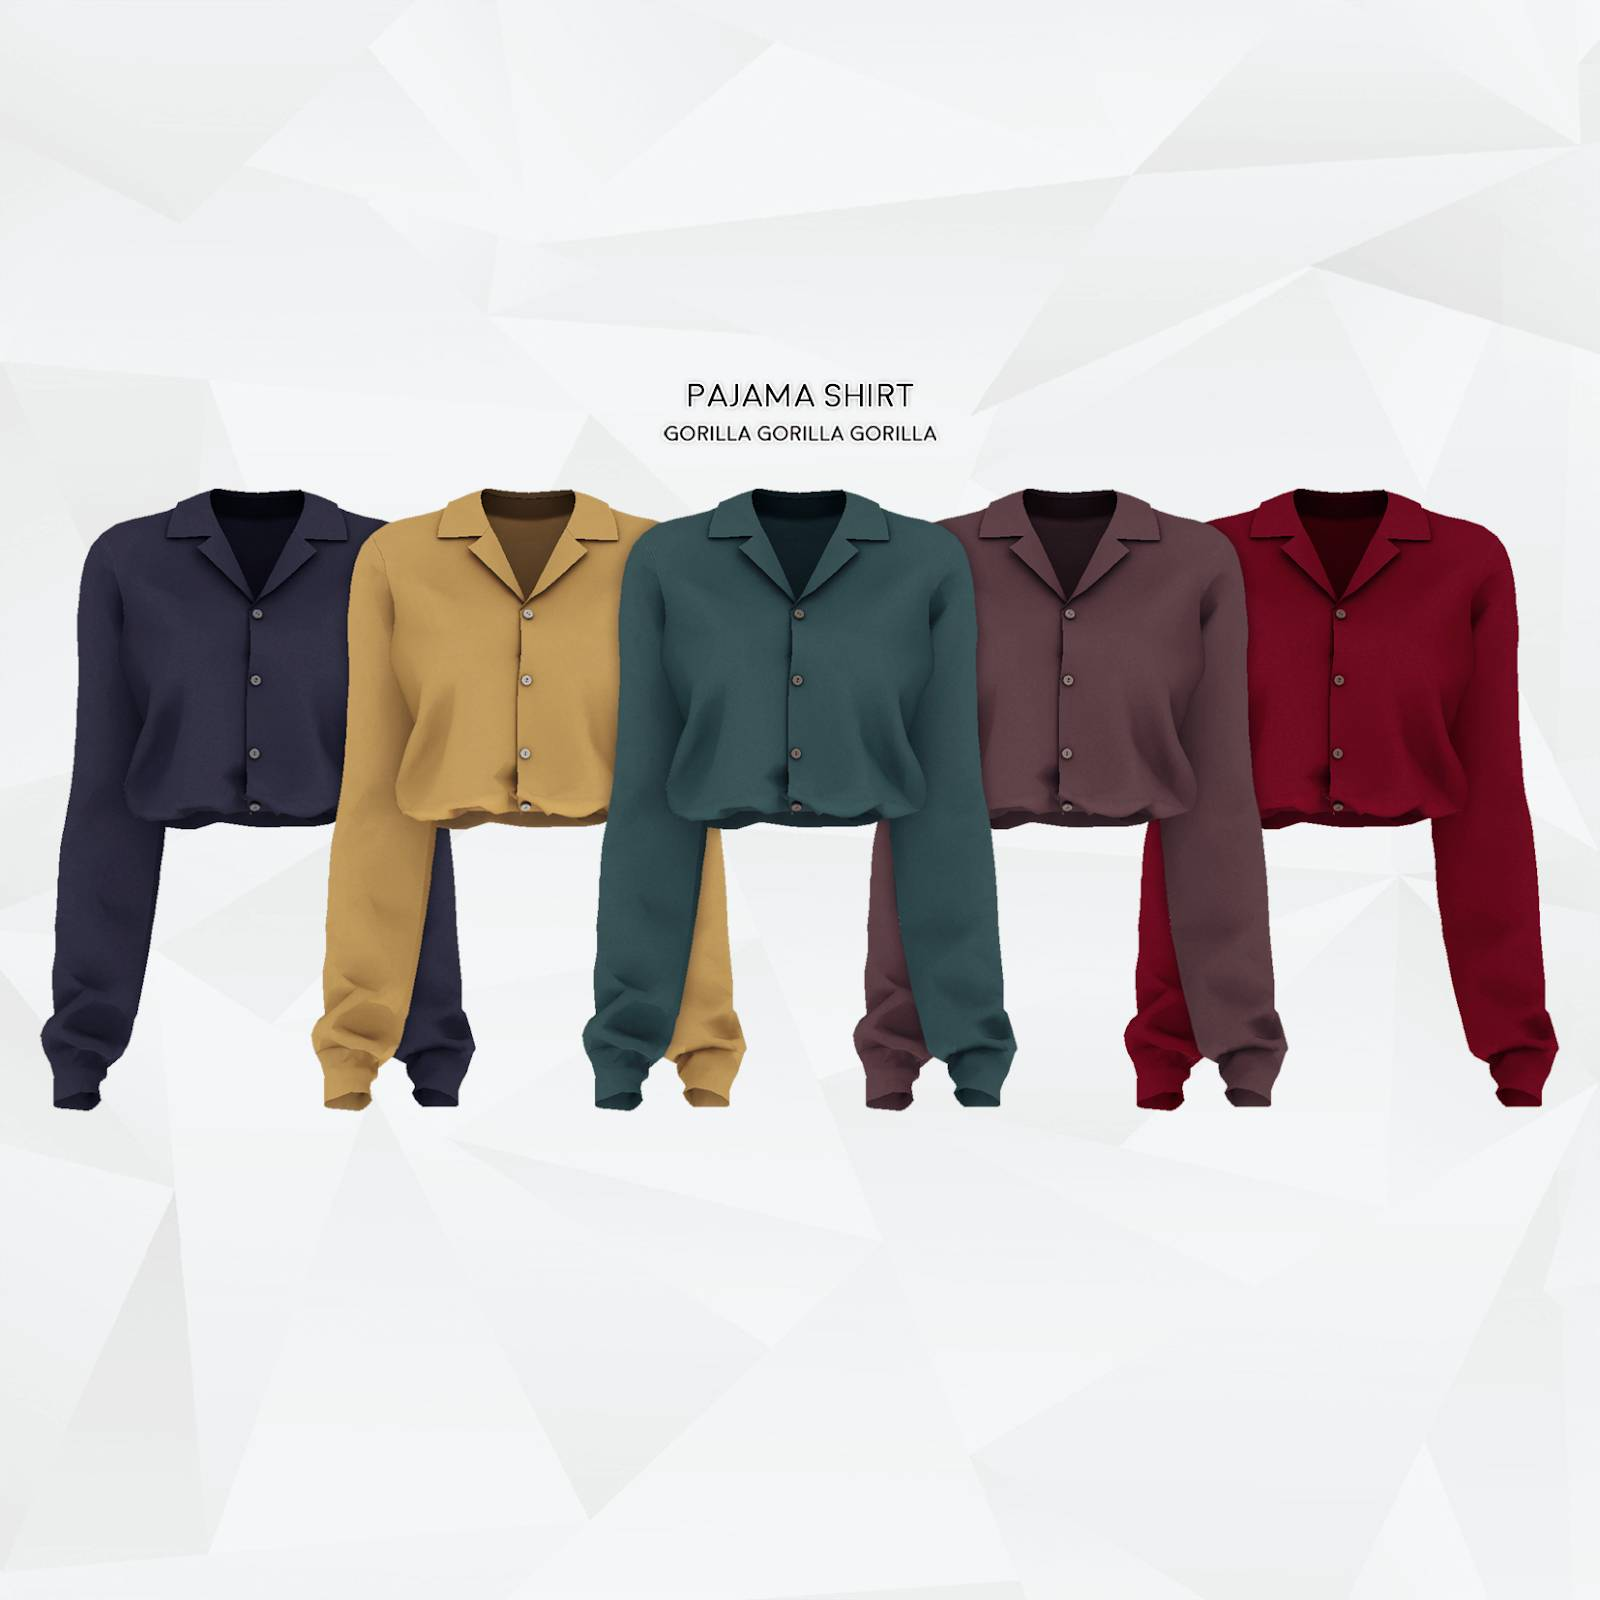 Рубашка - Pajama Shirt gorillax3